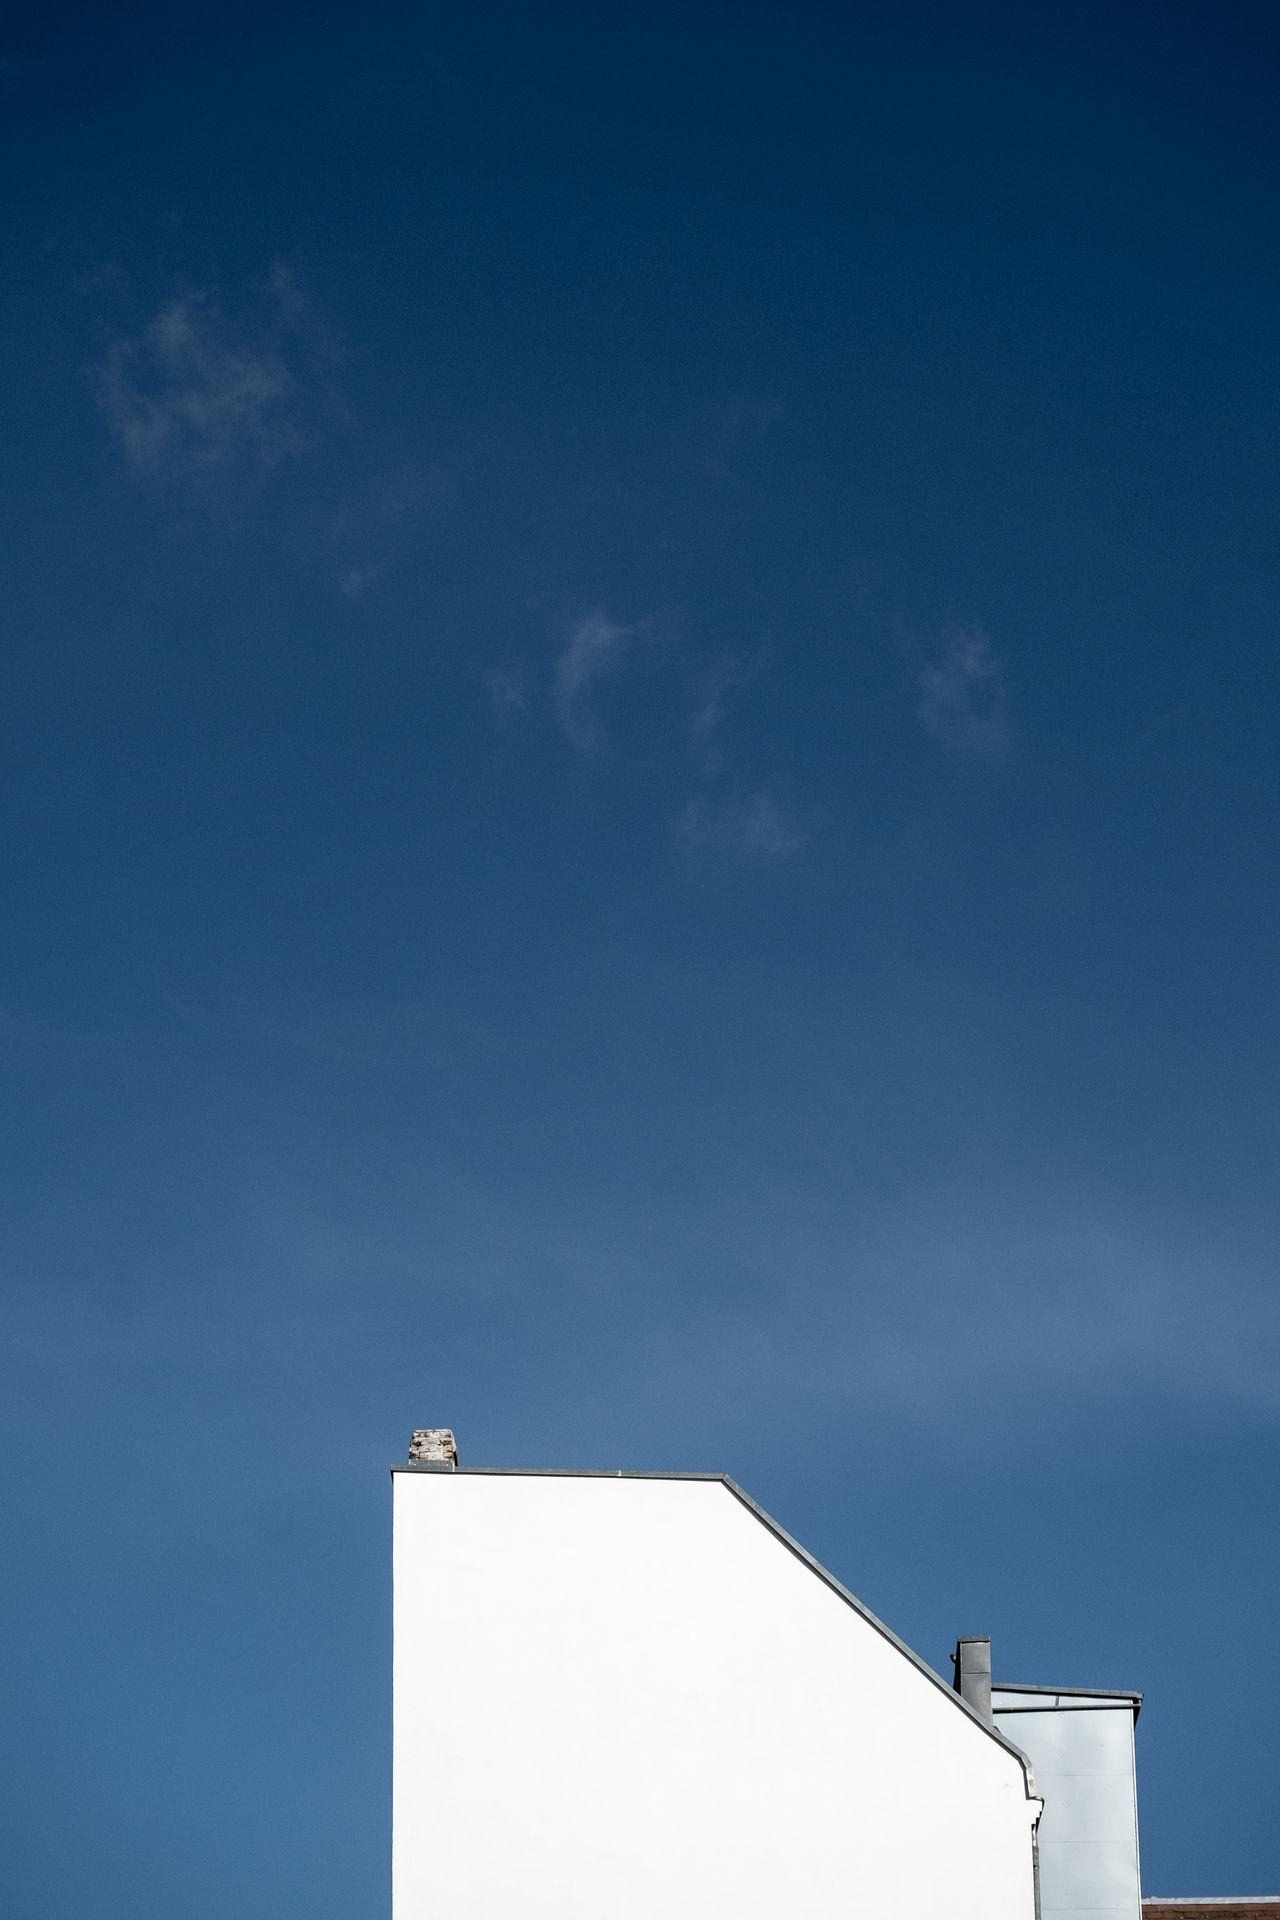 Lastonefromthisbuilding Architectural Detail Architectural Feature Architecture Architecture_collection Architecturelovers Blue Sky Building And Sky Building Exterior Building Story Buildings Buildings & Sky City Life Cityexplorer Day Façade Minimalism Minimalist Minimalobsession No People Outdoors Simplicity Sky